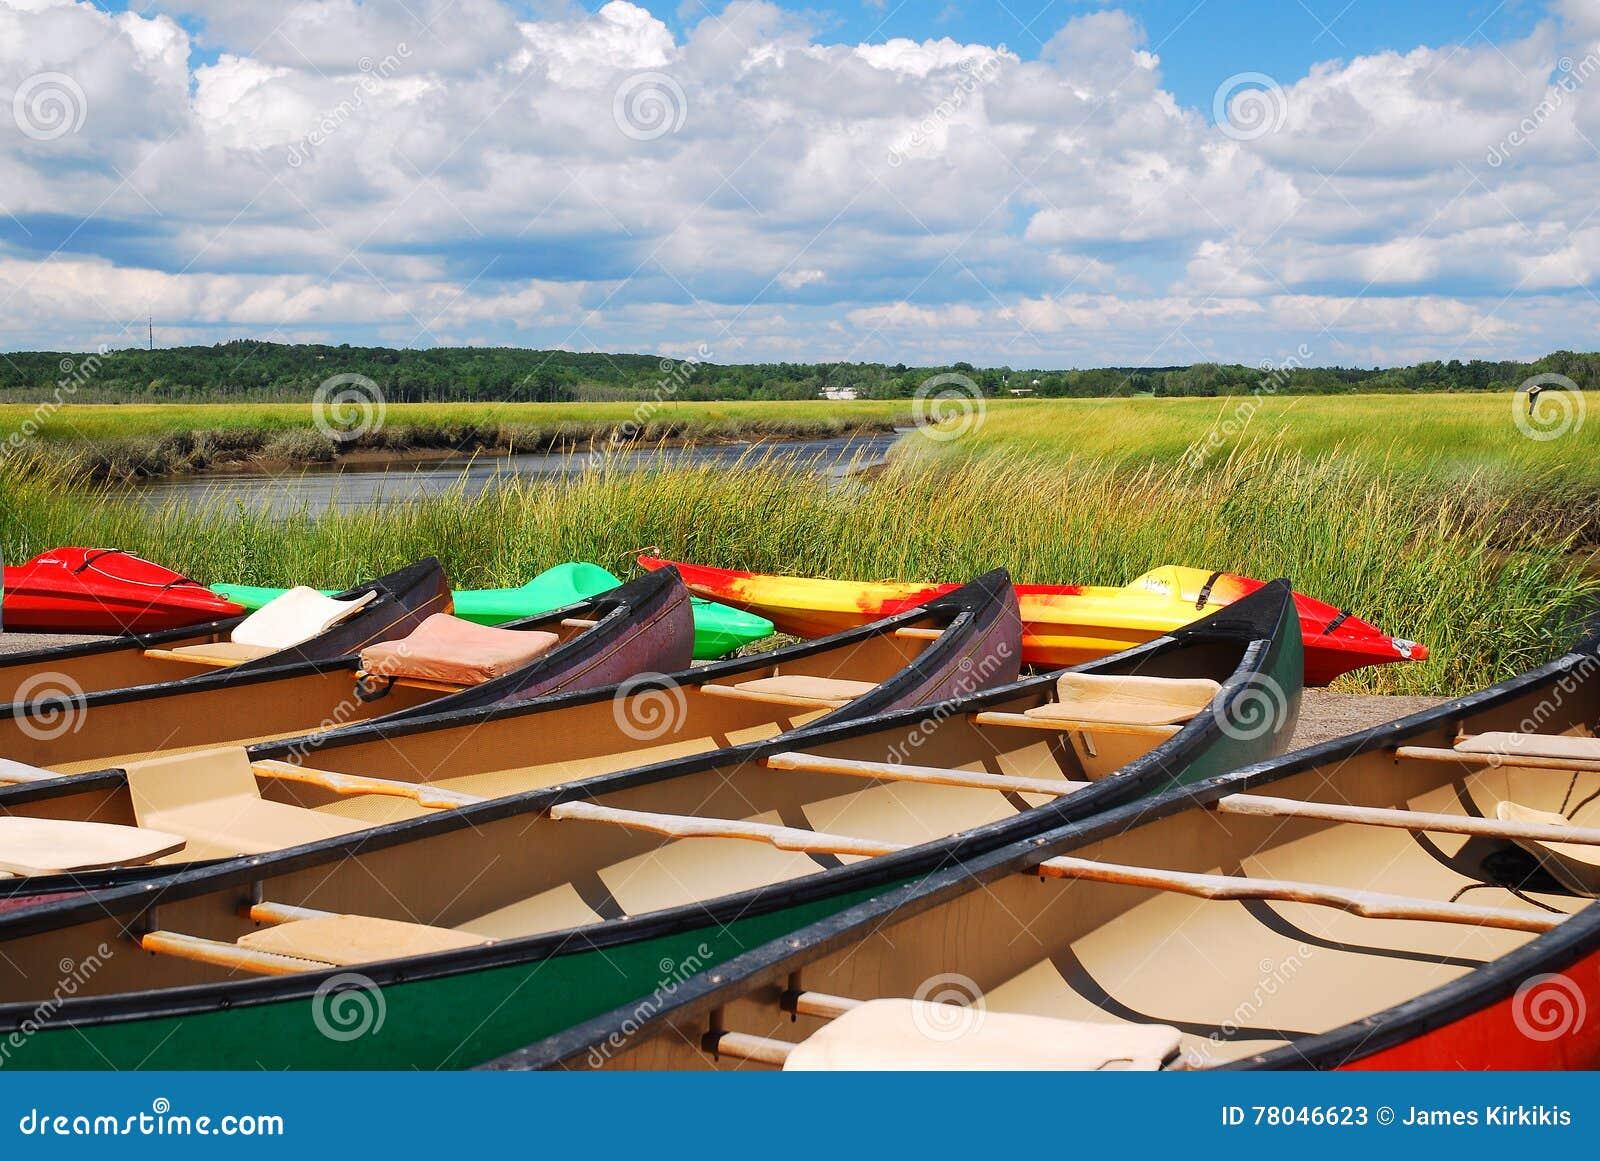 Les canoës attendent